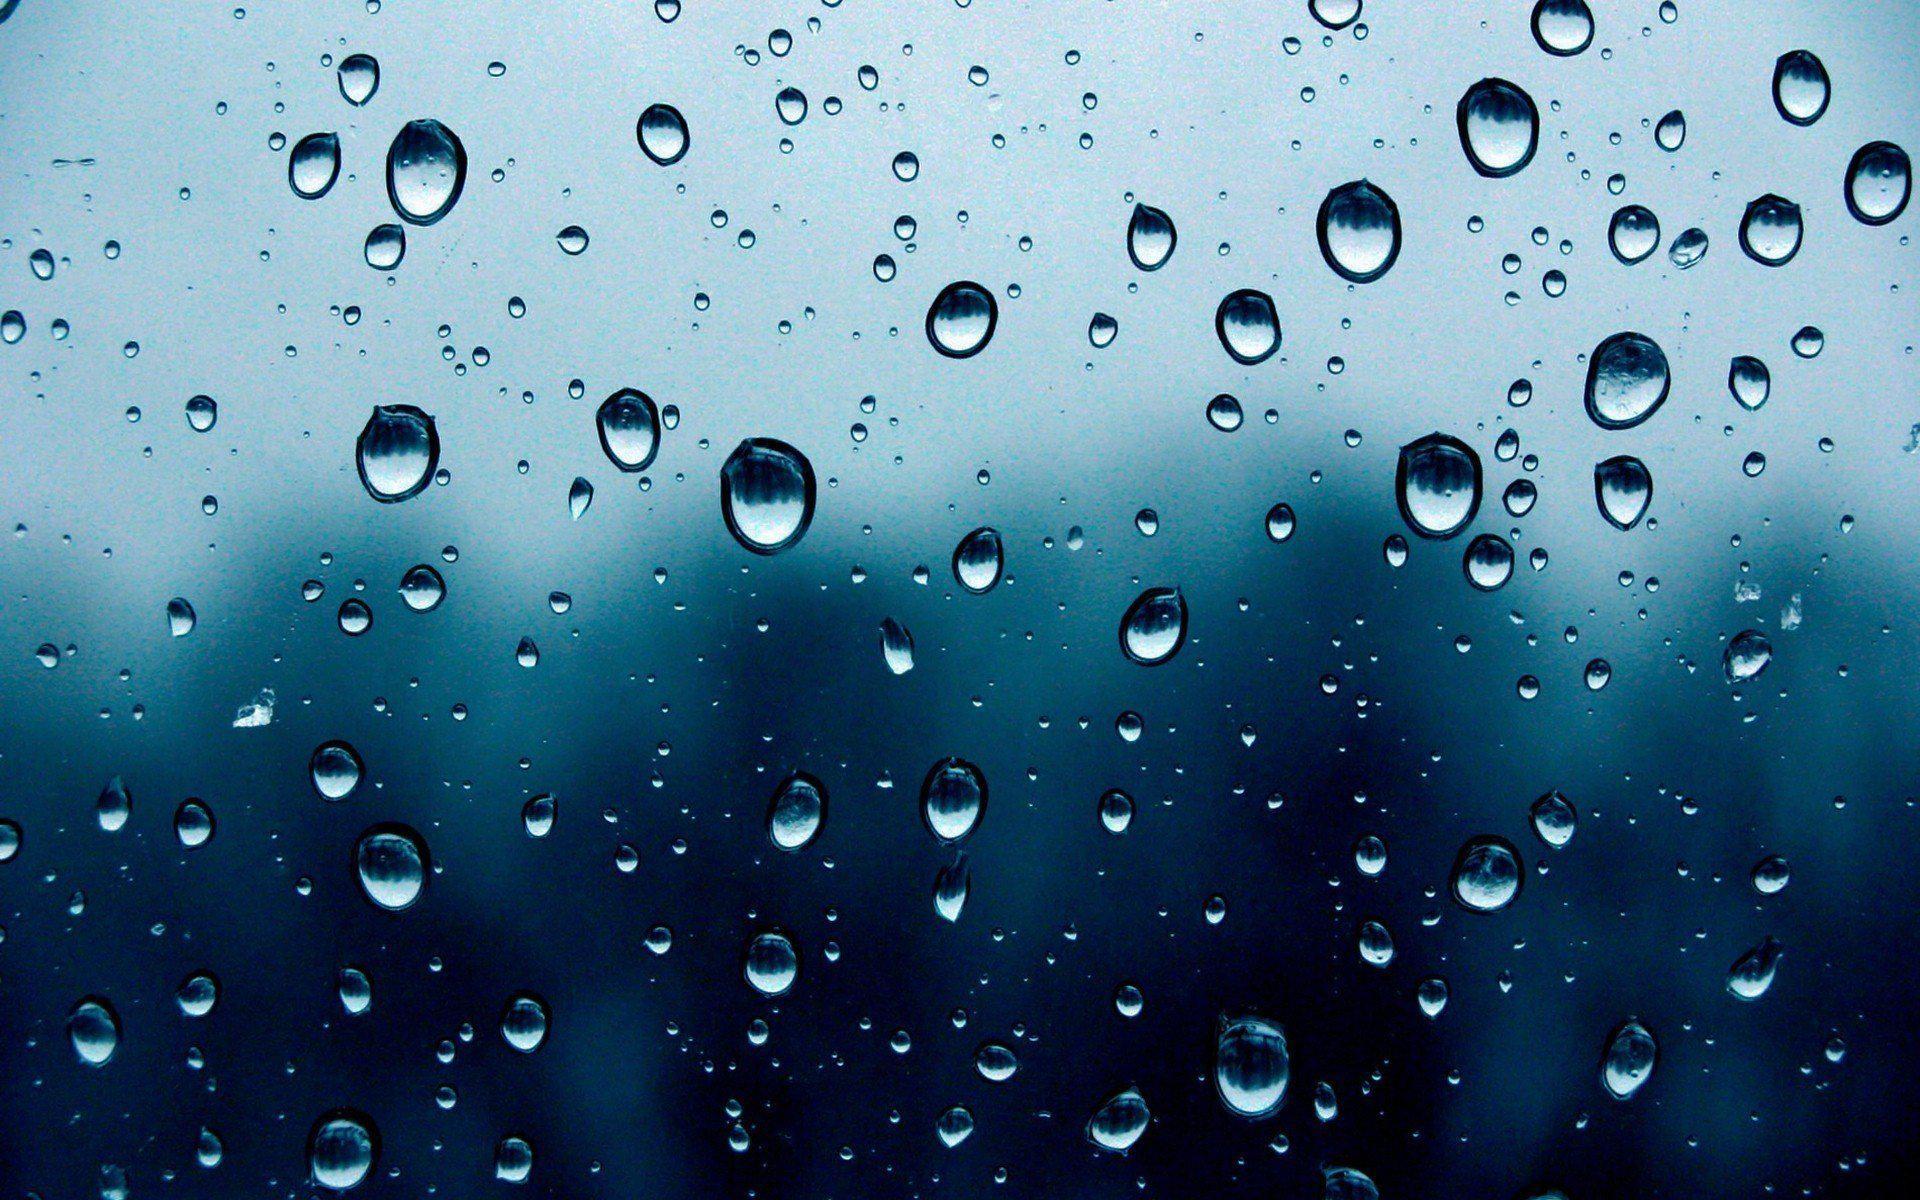 League Of Legends Animated Wallpaper Windows 10 Hd Rain Weather Water Drops Condensation Glass Desktop